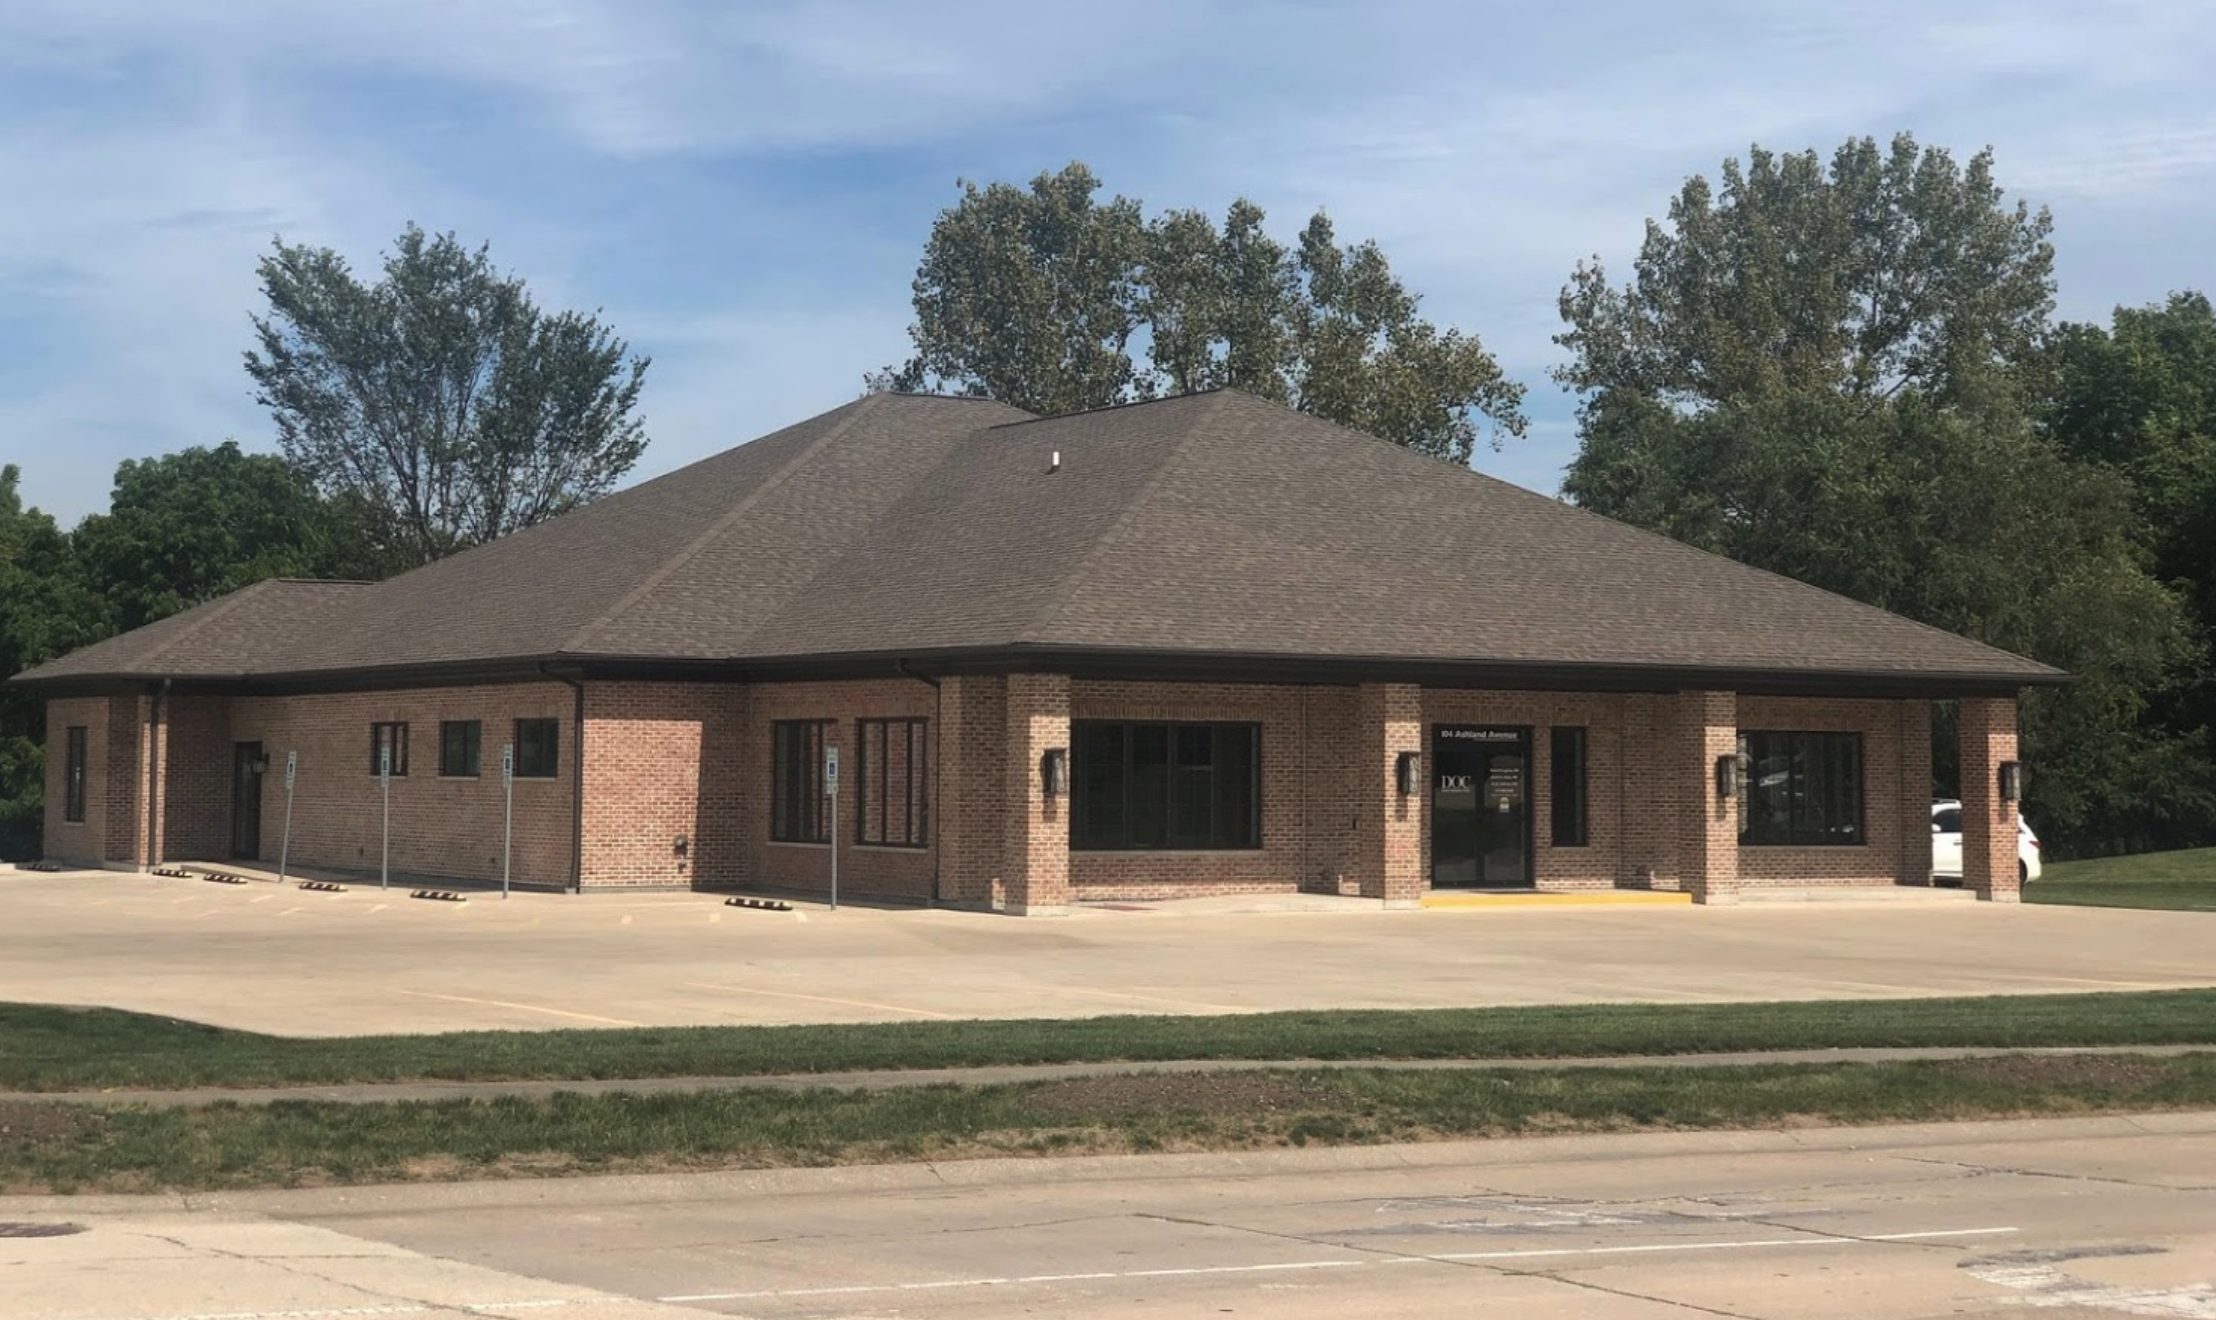 The Decatur Orthopedic Center in Mt Zion Illinois